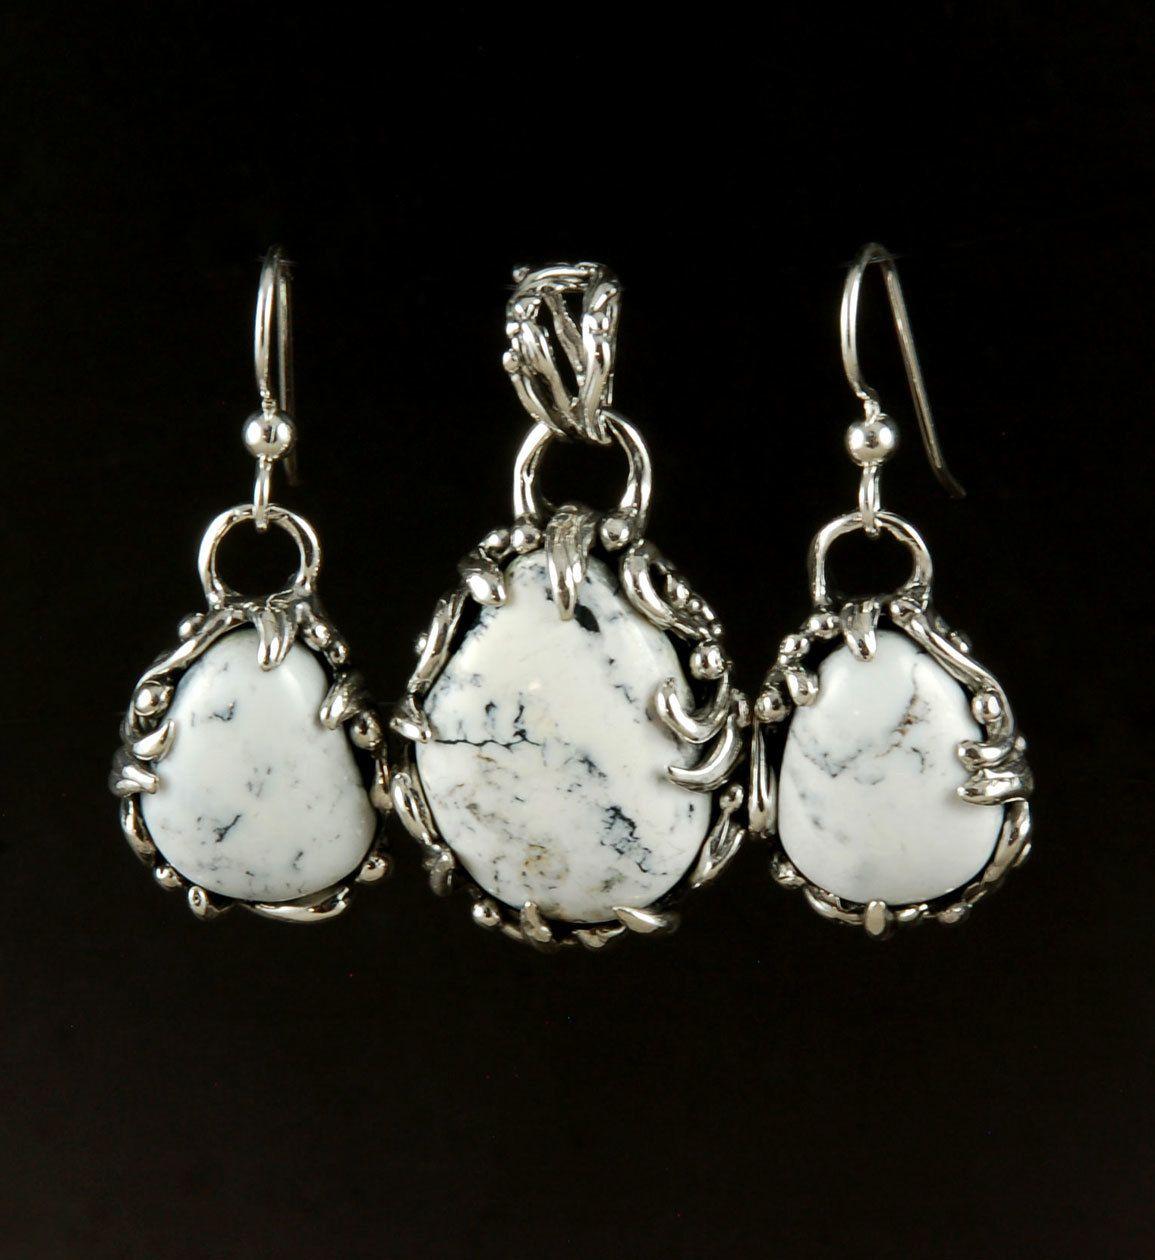 Organic white buffalo pendant and earrings set by nattarika hartman